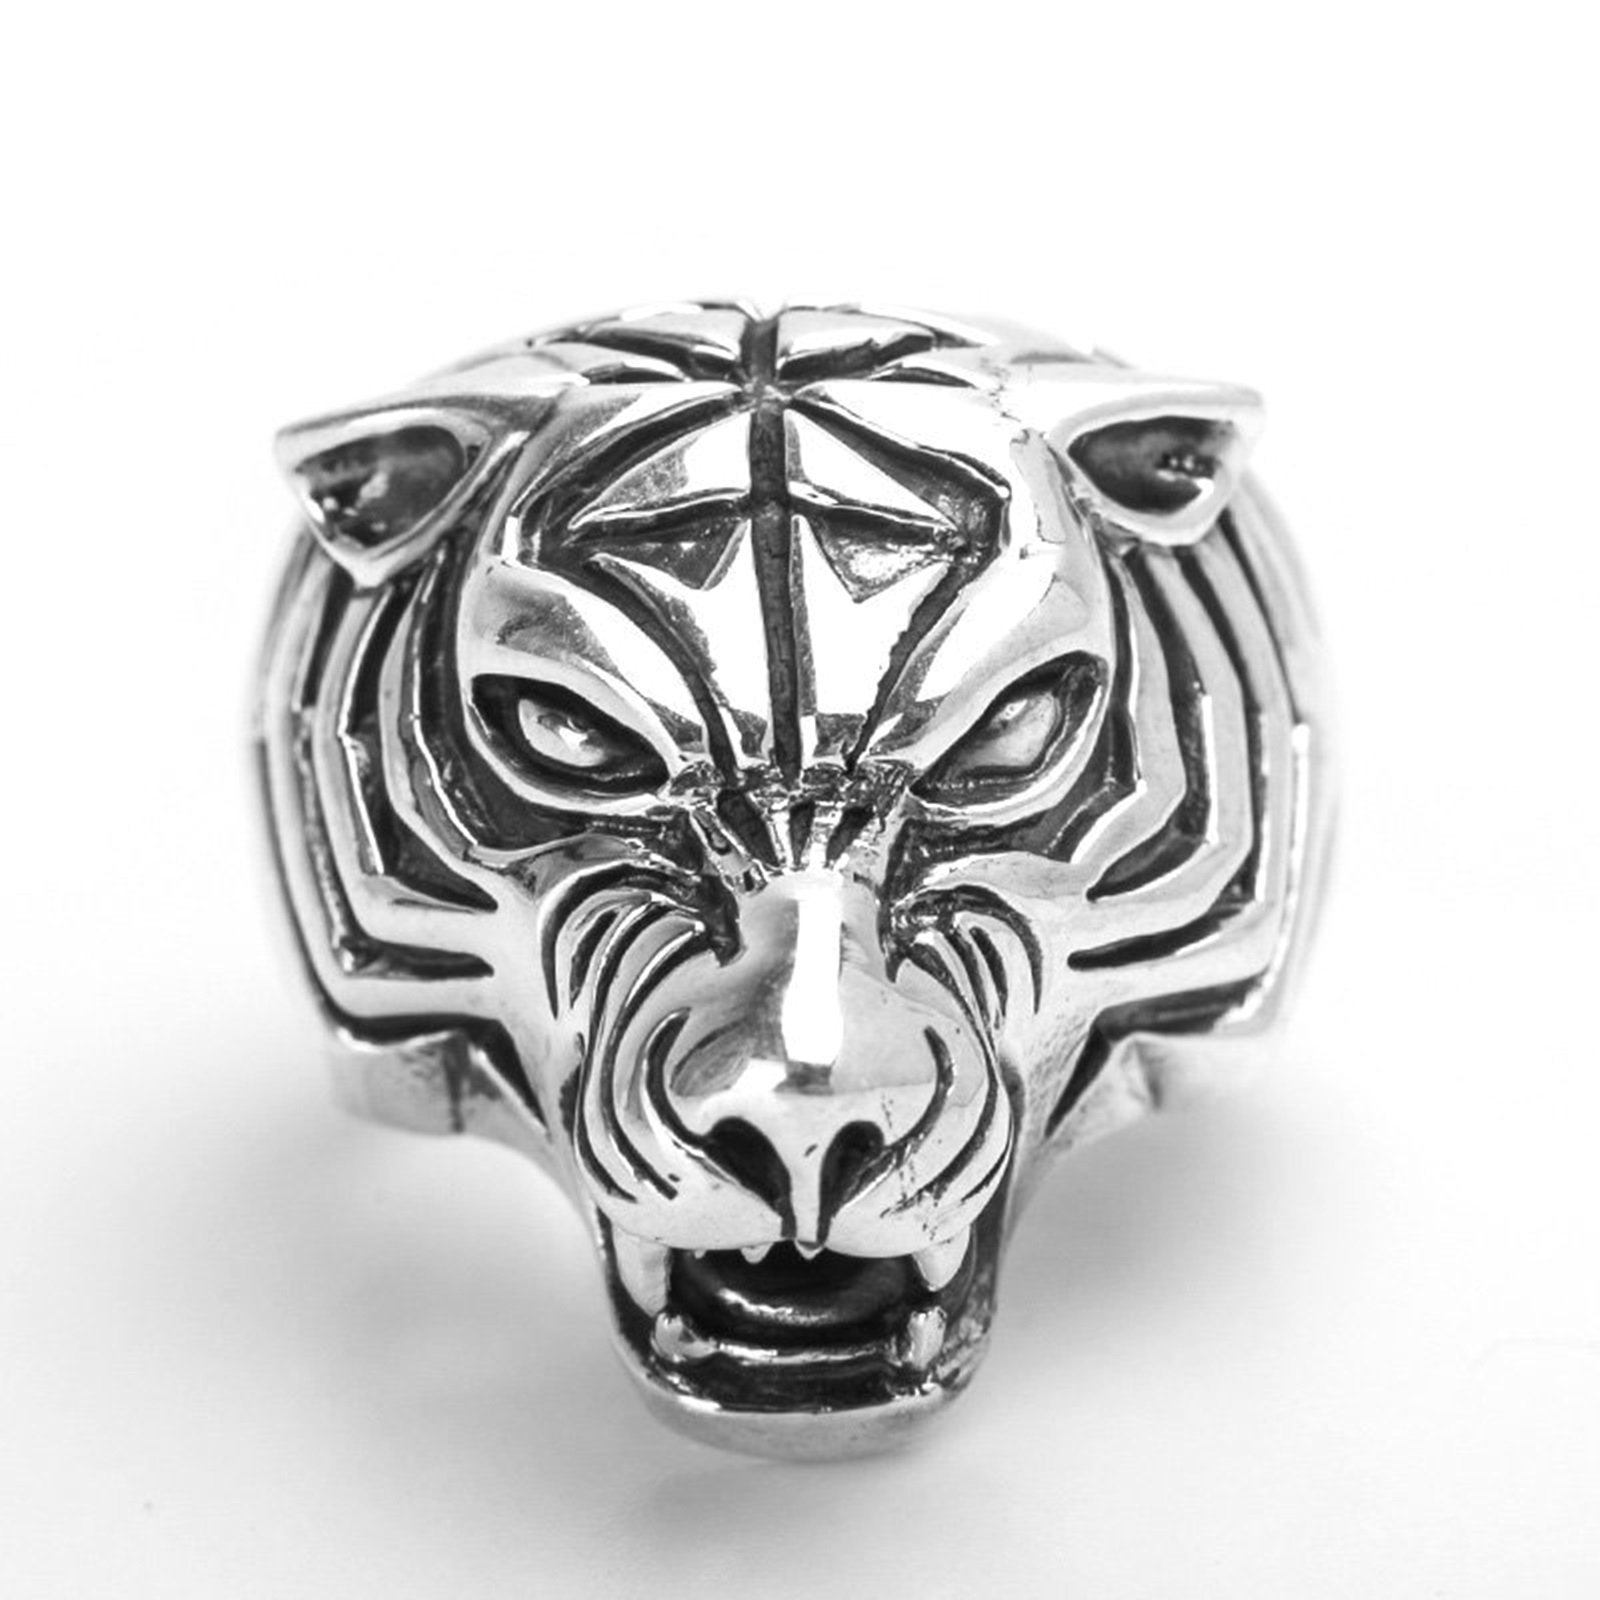 Anazoz S925 Sterling Silver Retro Style Men's Vintage Gothic Tribal Biker Tiger Rings Size 8 by AnaZoz